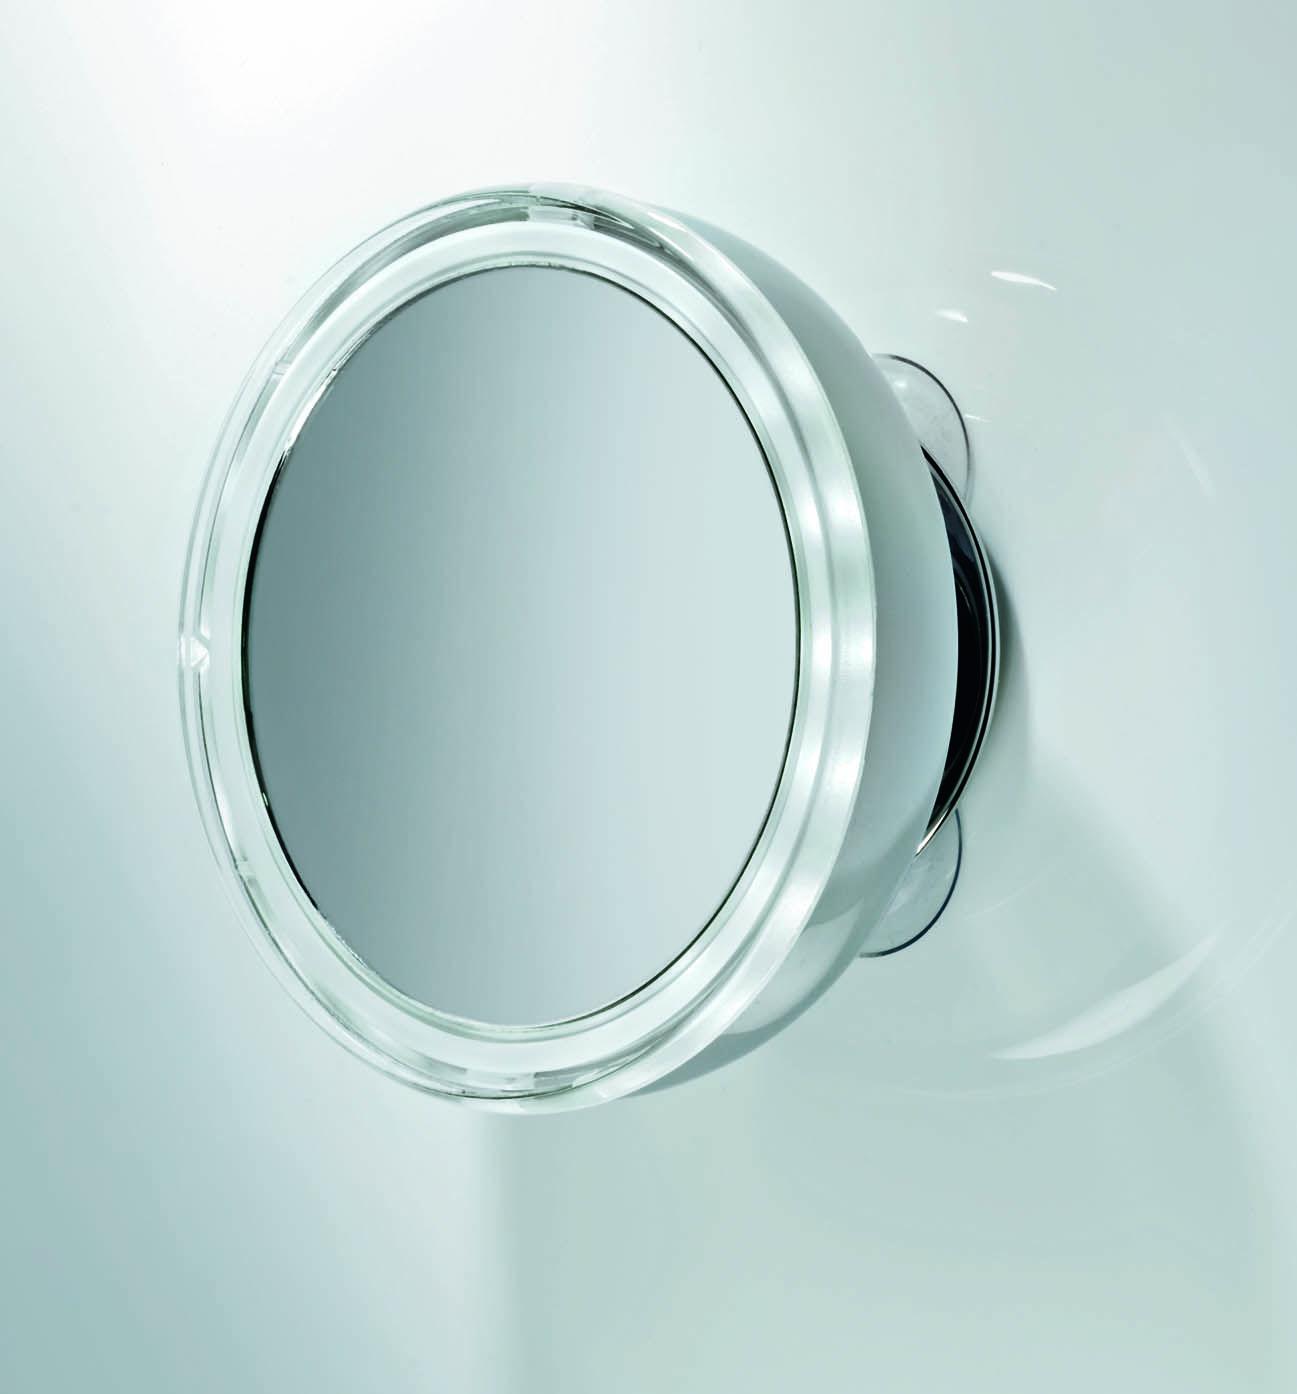 Super Reis Make-up spiegel met LED verlichting - Passier - Den Haag TV-15